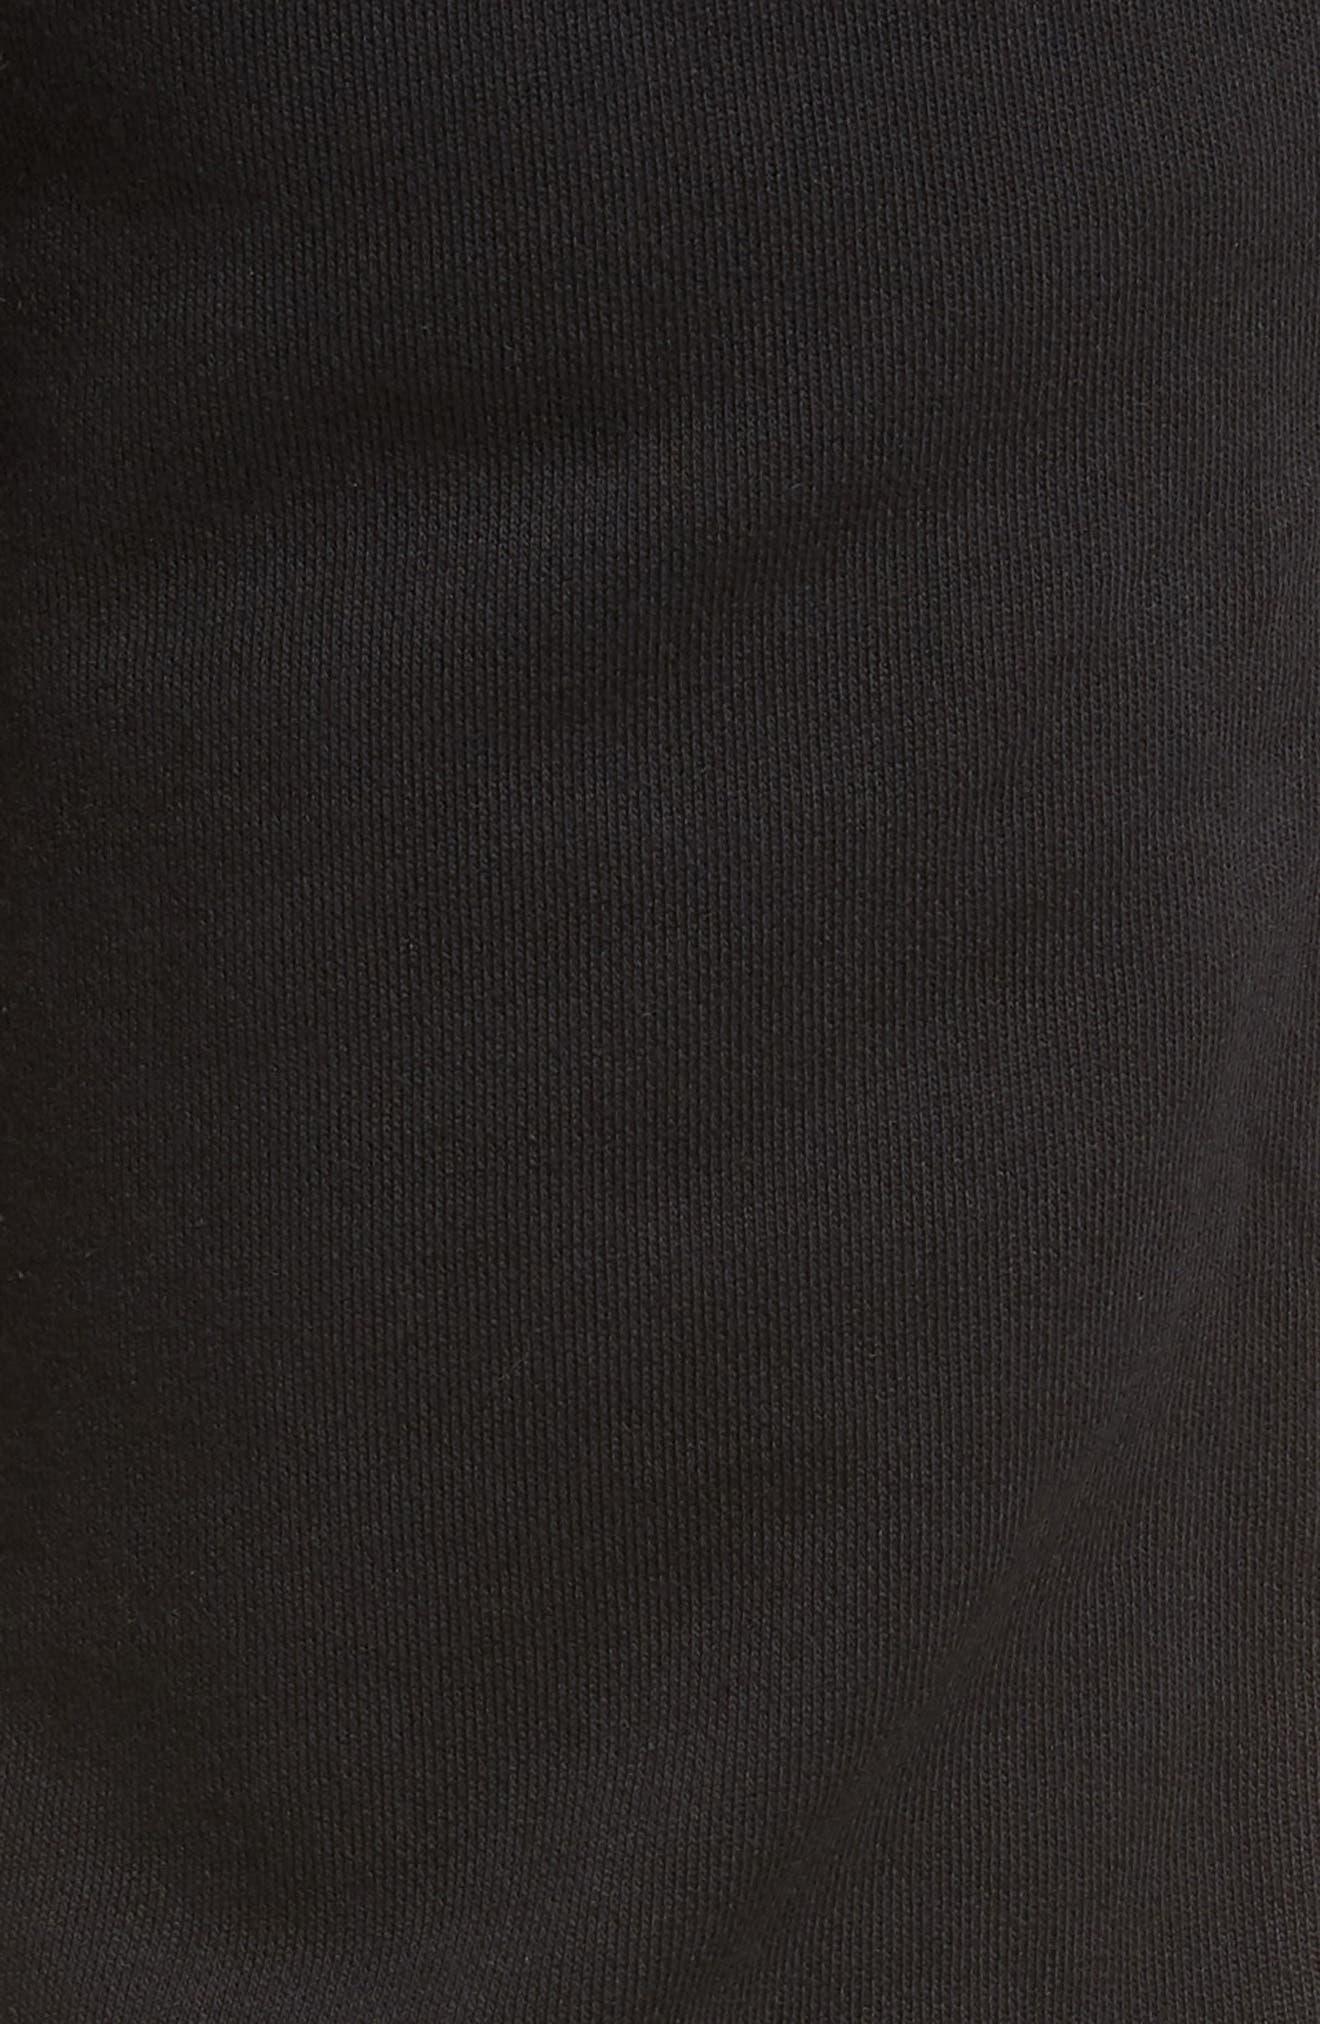 Jumpshot Slim Track Pants,                             Alternate thumbnail 5, color,                             BLACK/ BISCUIT